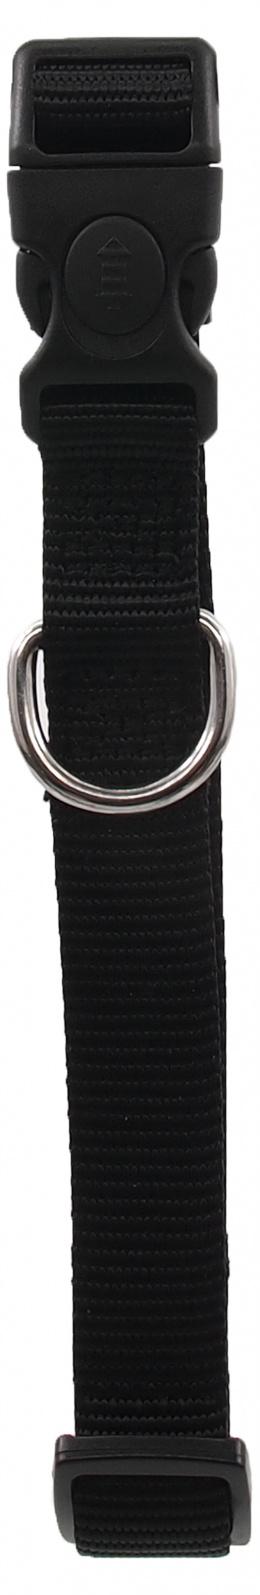 Kakla siksna - Dog Fantasy Classic M, 2cm, 34-49cm, krāsa - melna